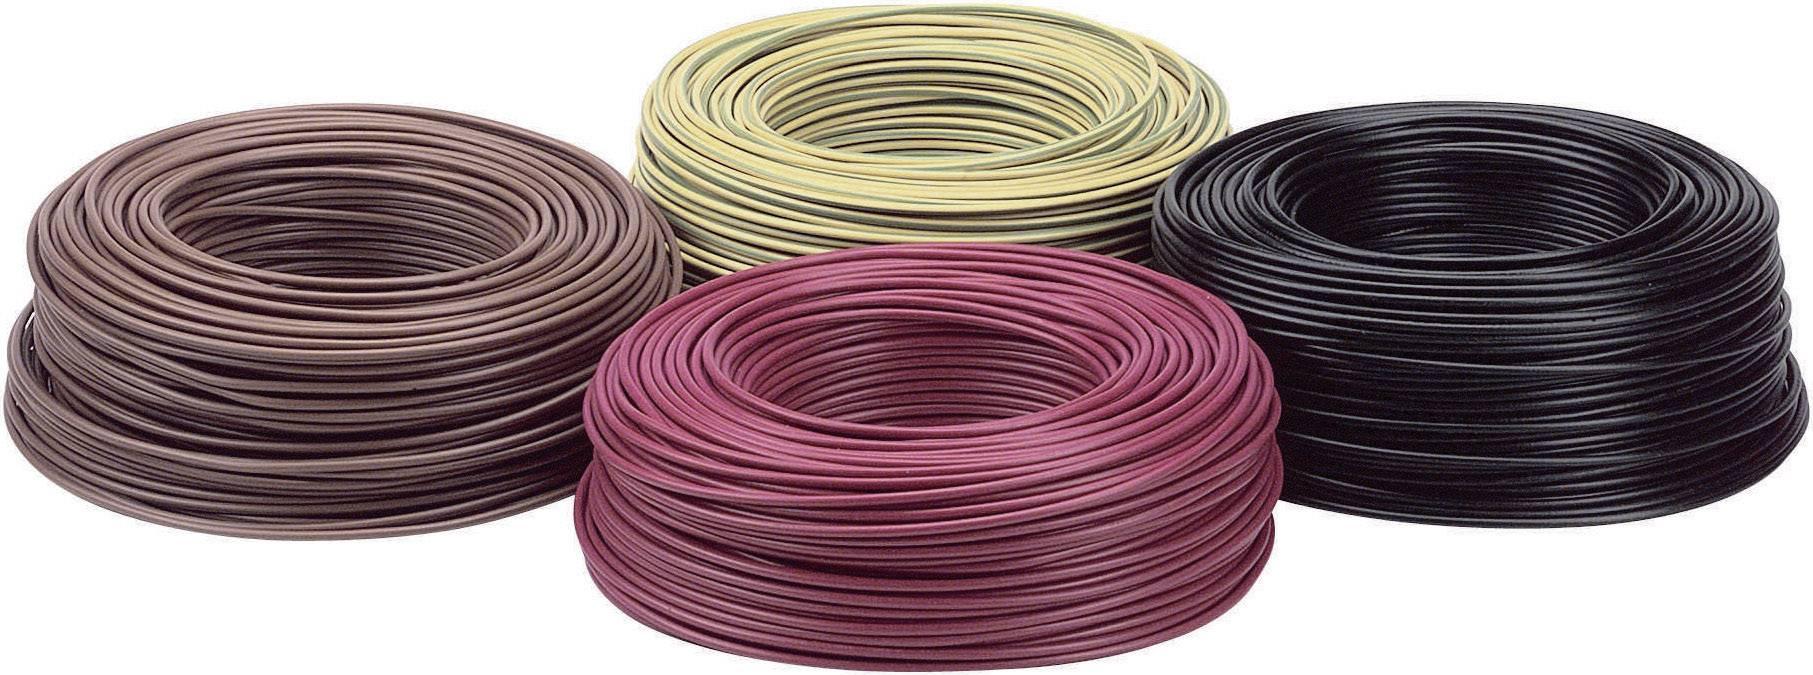 Stikalna žica H07V-U 1 x 1.50 mm, vijolična LappKabel 78110400 100 m